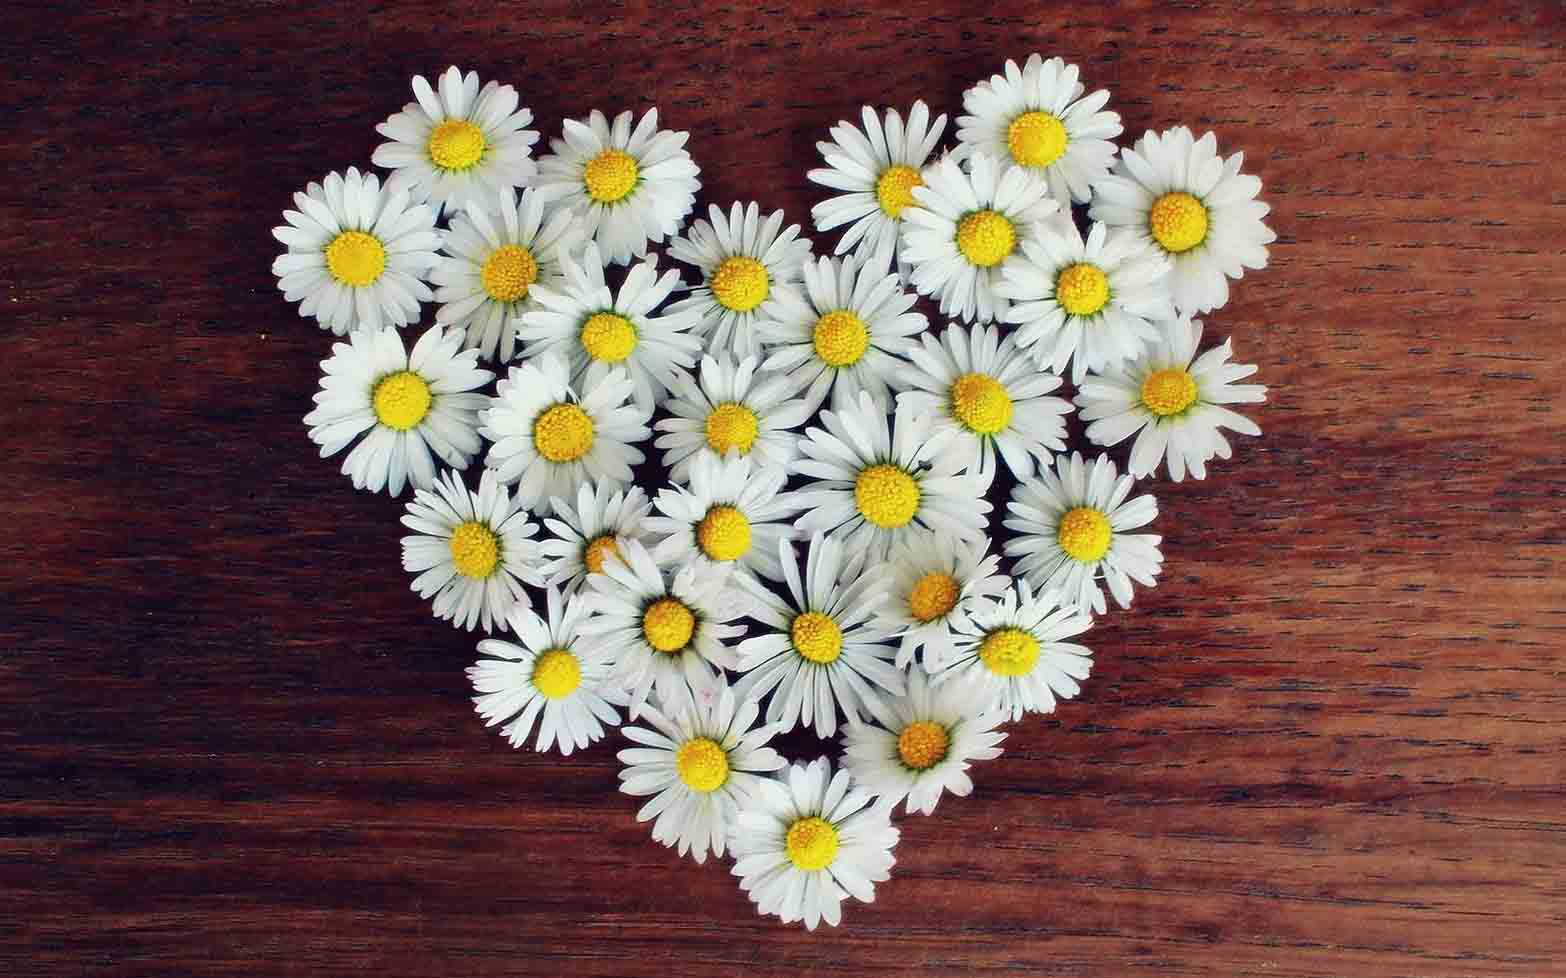 Whatsapp profile pic flowers images higtwallaper hd beautiful flower images for whatsapp profile dp funny izmirmasajfo